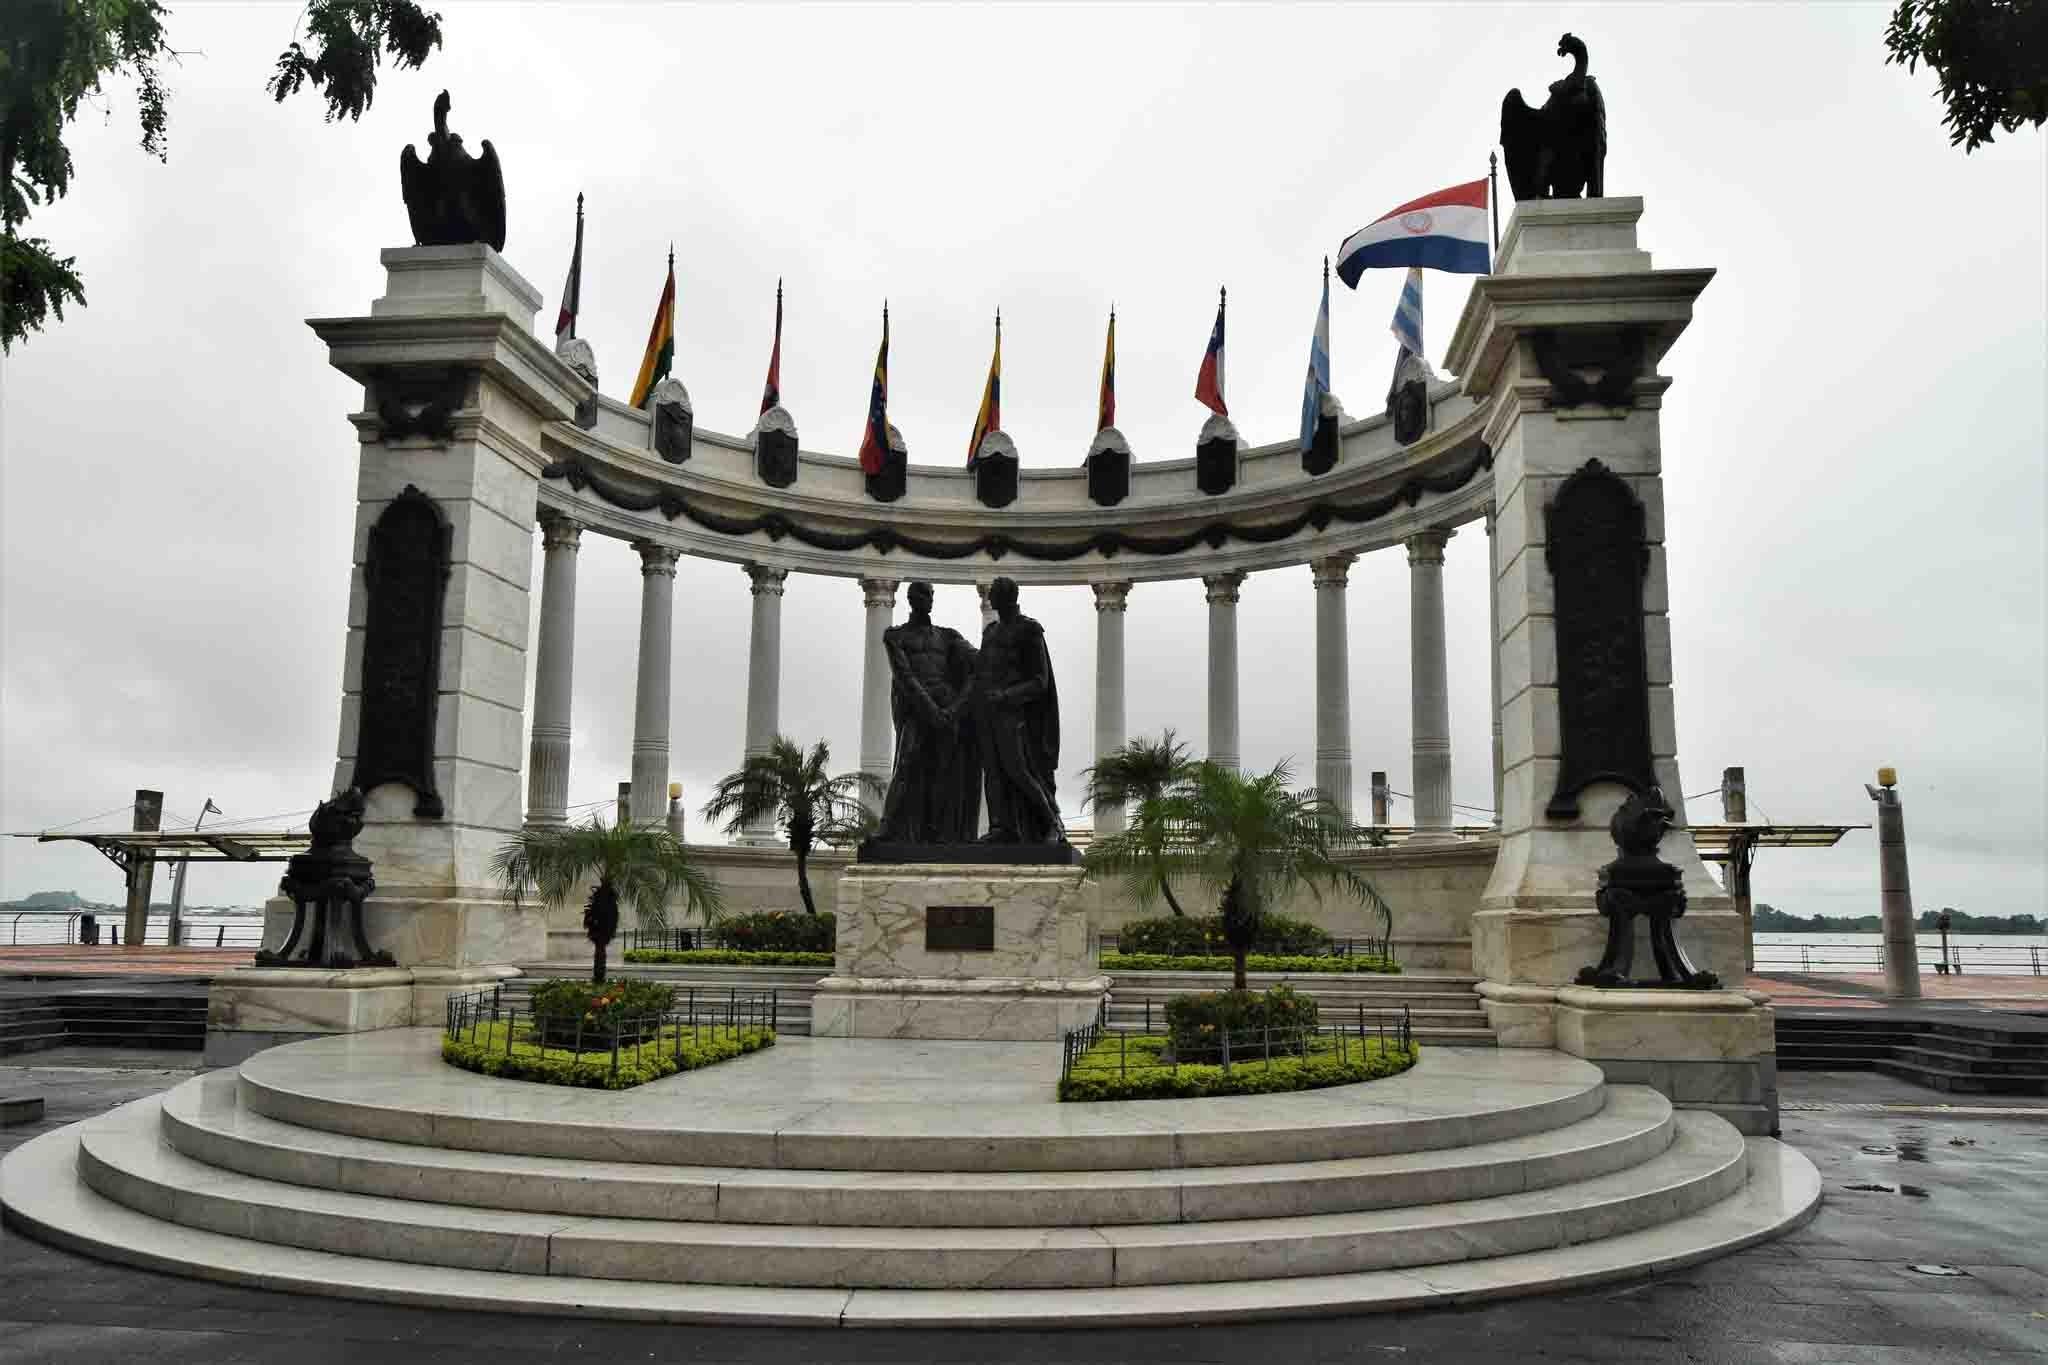 Guayaquil coast